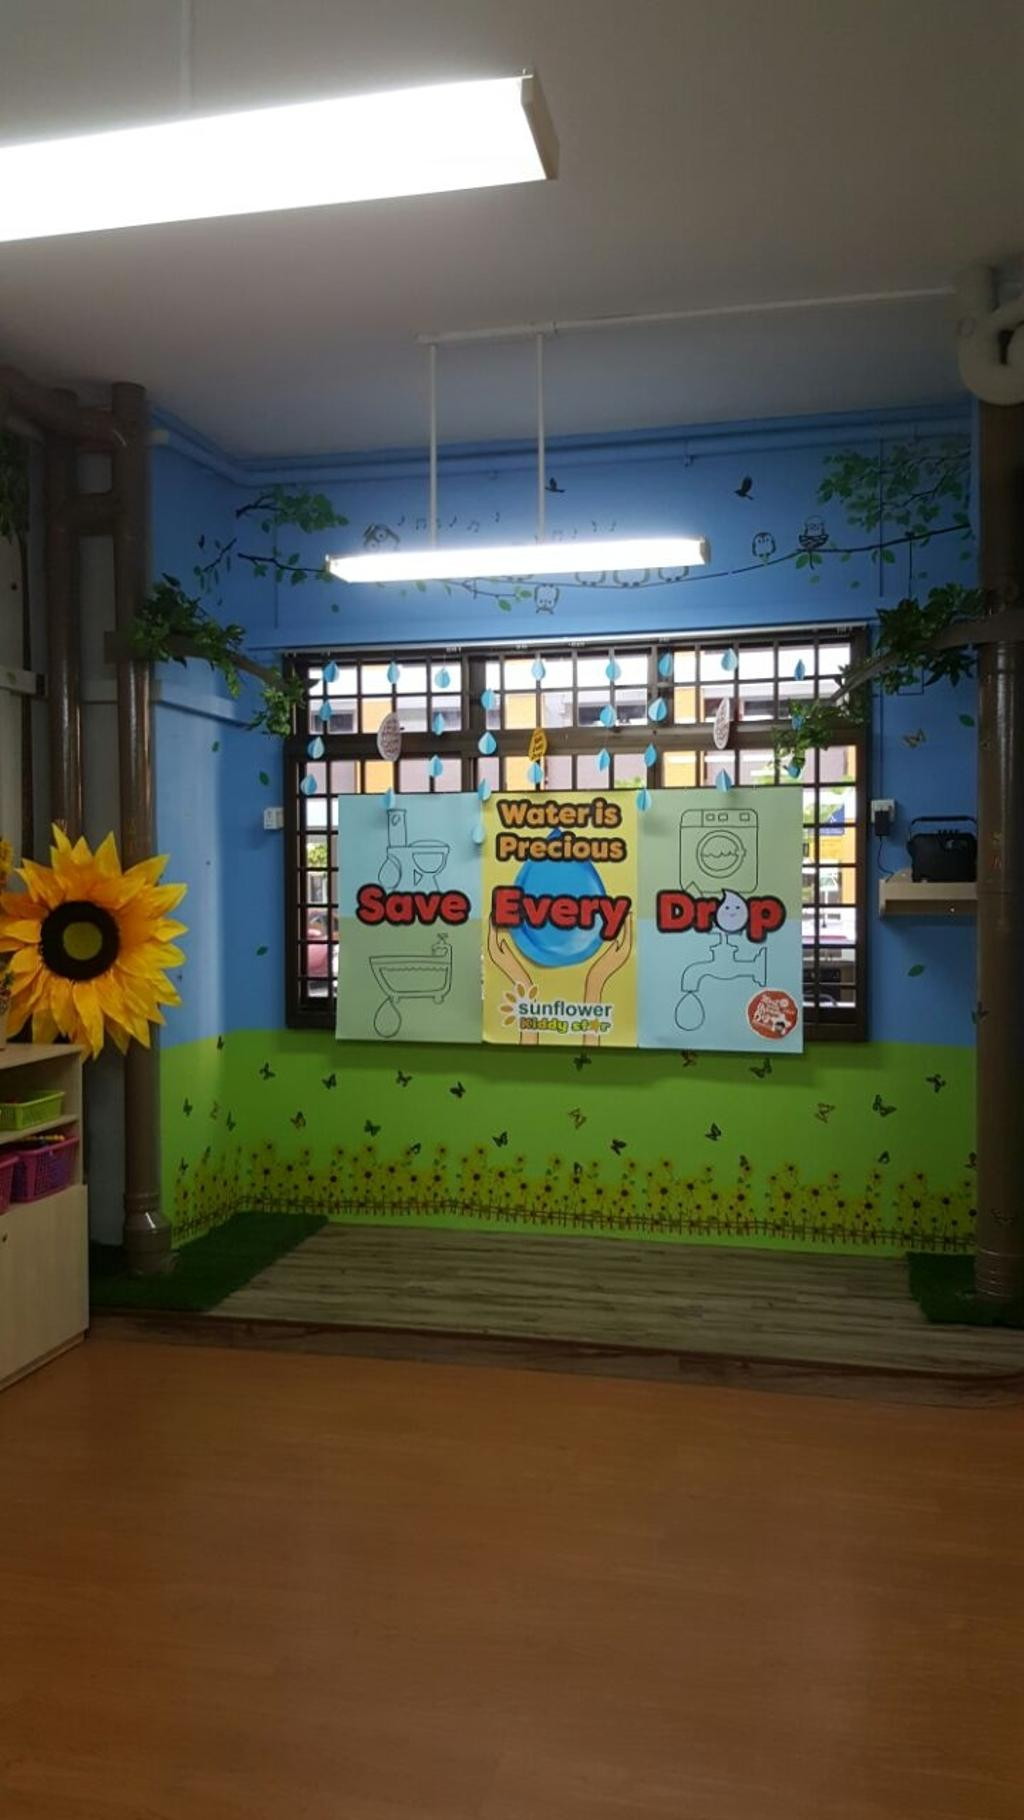 Sunflower Kindergarten, Commercial, Interior Designer, Interior Diary, Minimalistic, Flora, Jar, Plant, Potted Plant, Pottery, Vase, Blossom, Flower, Sunflower